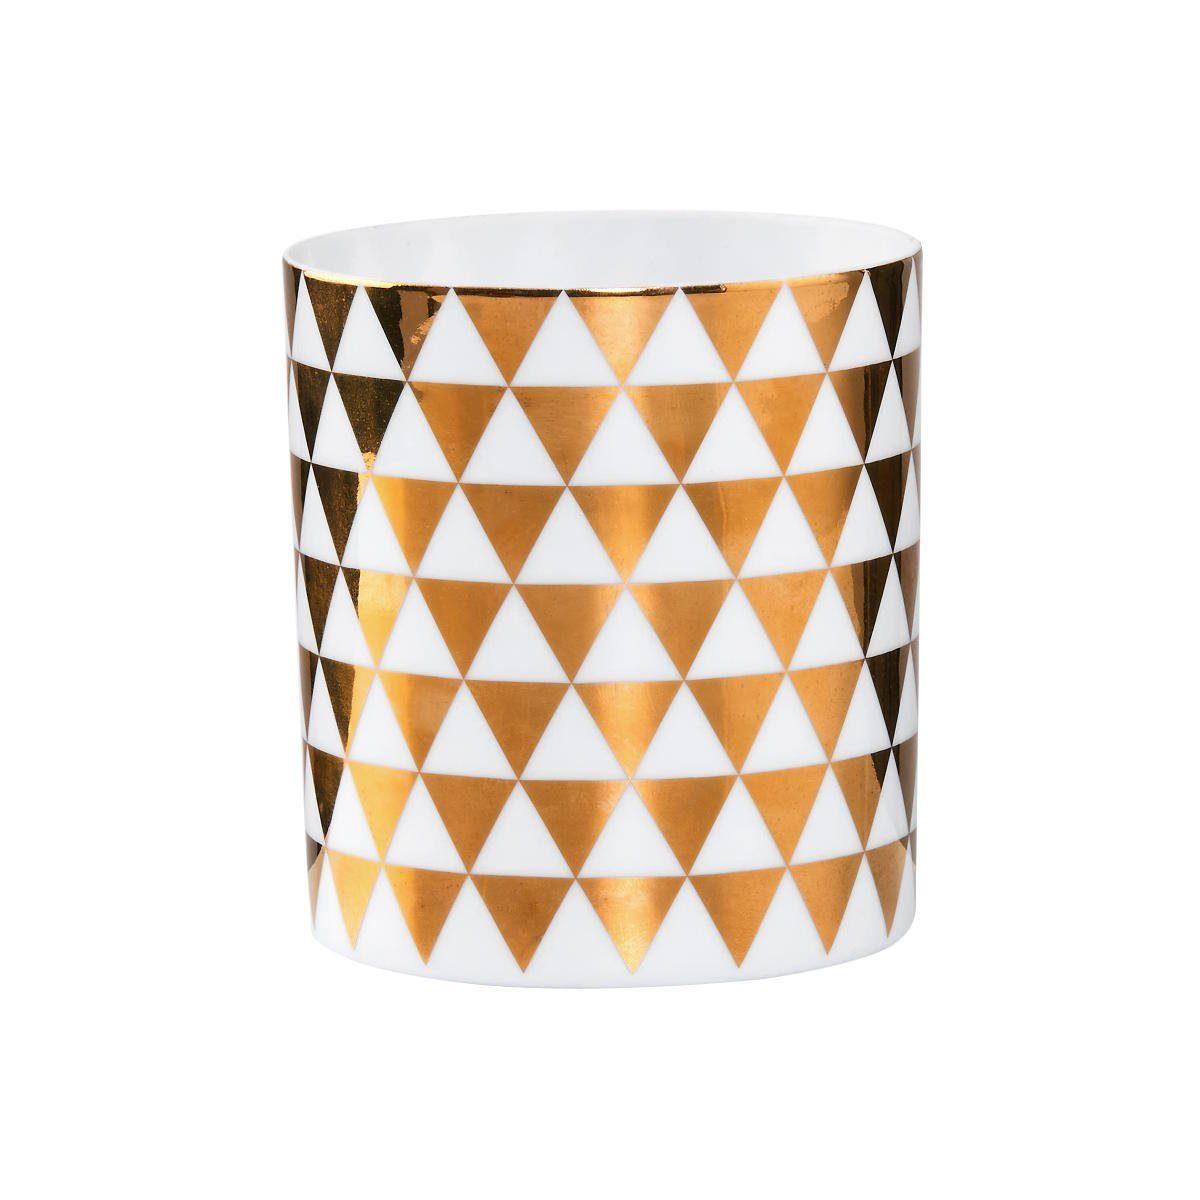 BUTLERS DELIGHT »Teelichthalter mit goldenen Rauten groß«